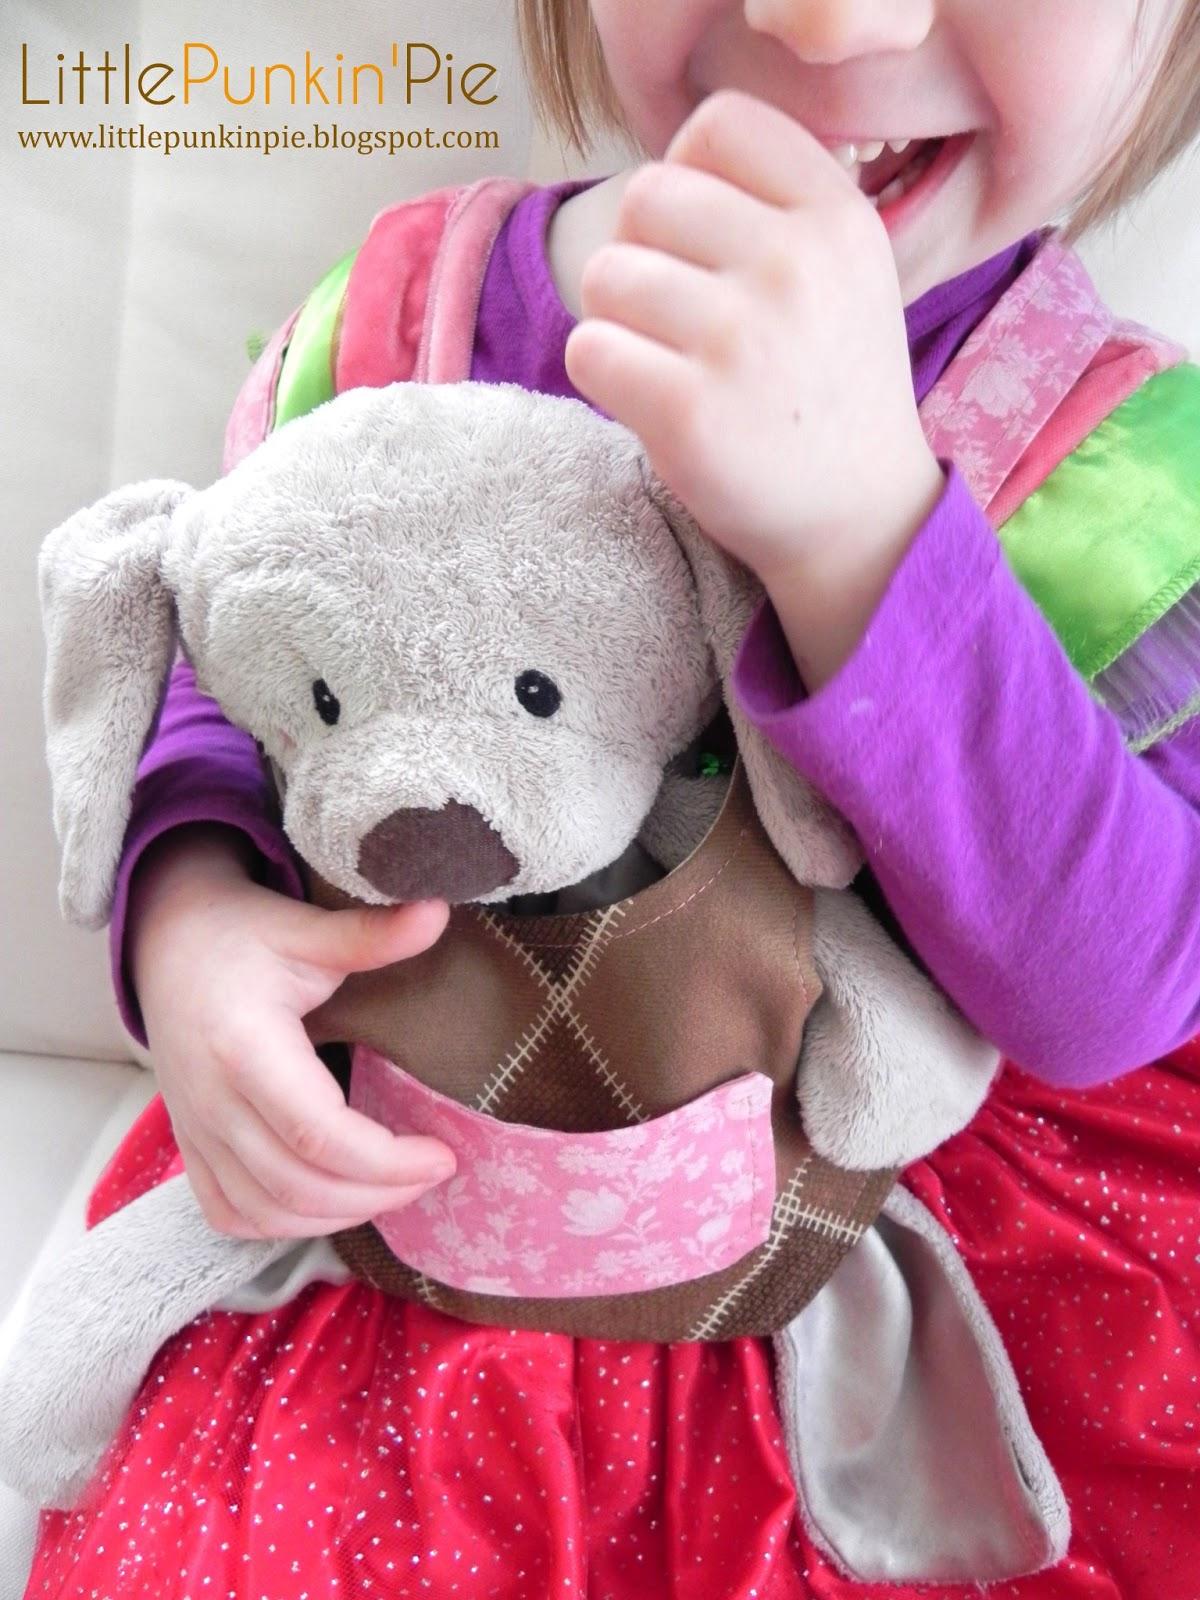 Littlepunkinpie Baby Doll Stuffed Animal Carrier Tutorial